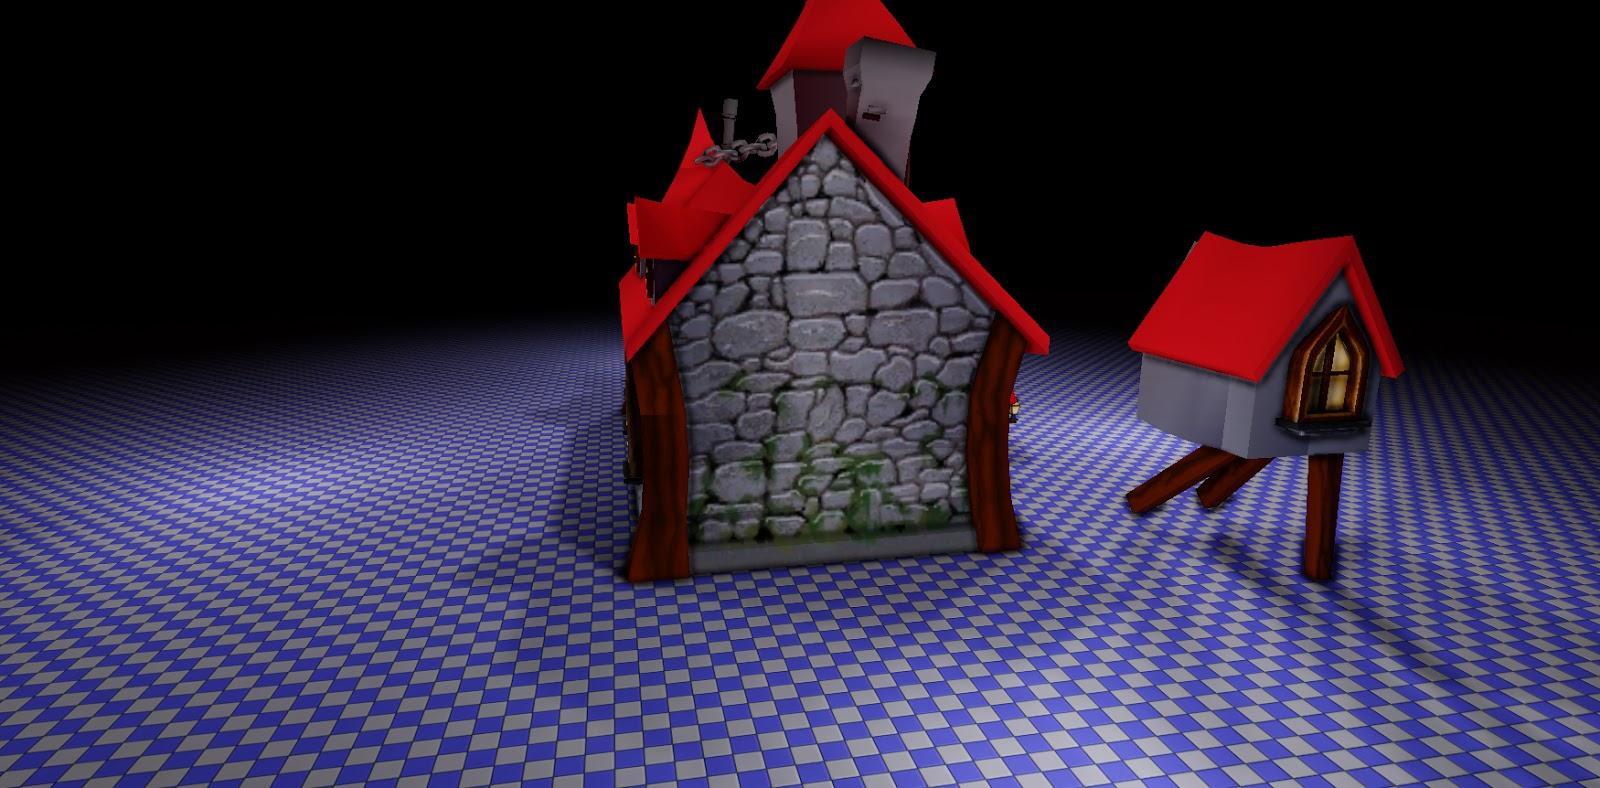 peter_Harries_UDK_house_texture1.jpg